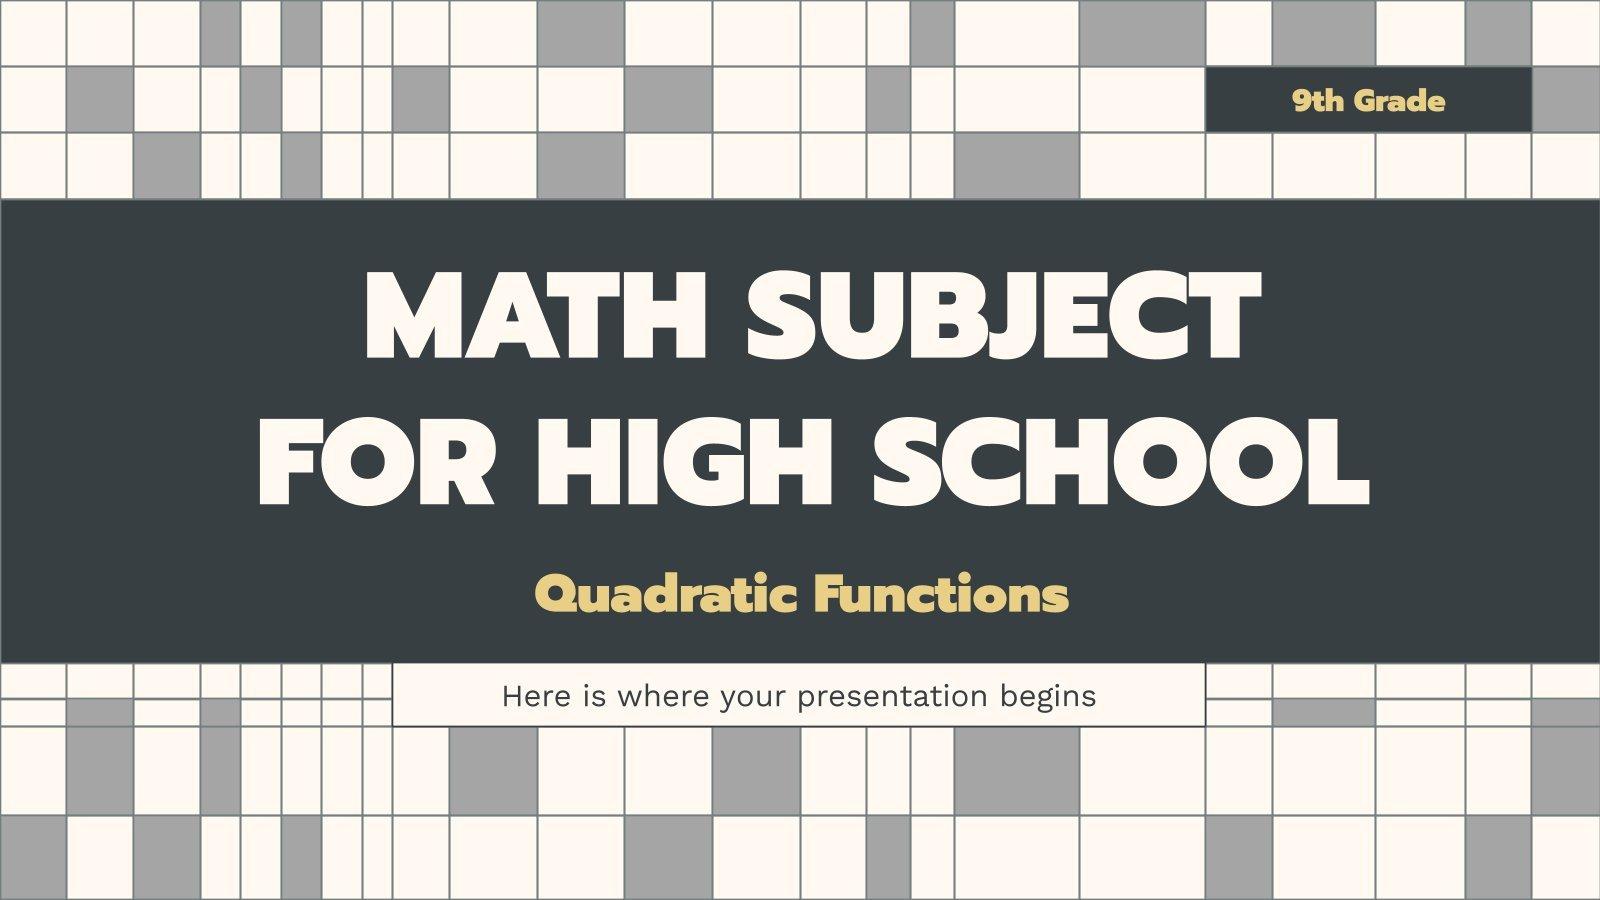 Math Subject for High School - 9th Grade: Quadratic Functions presentation template